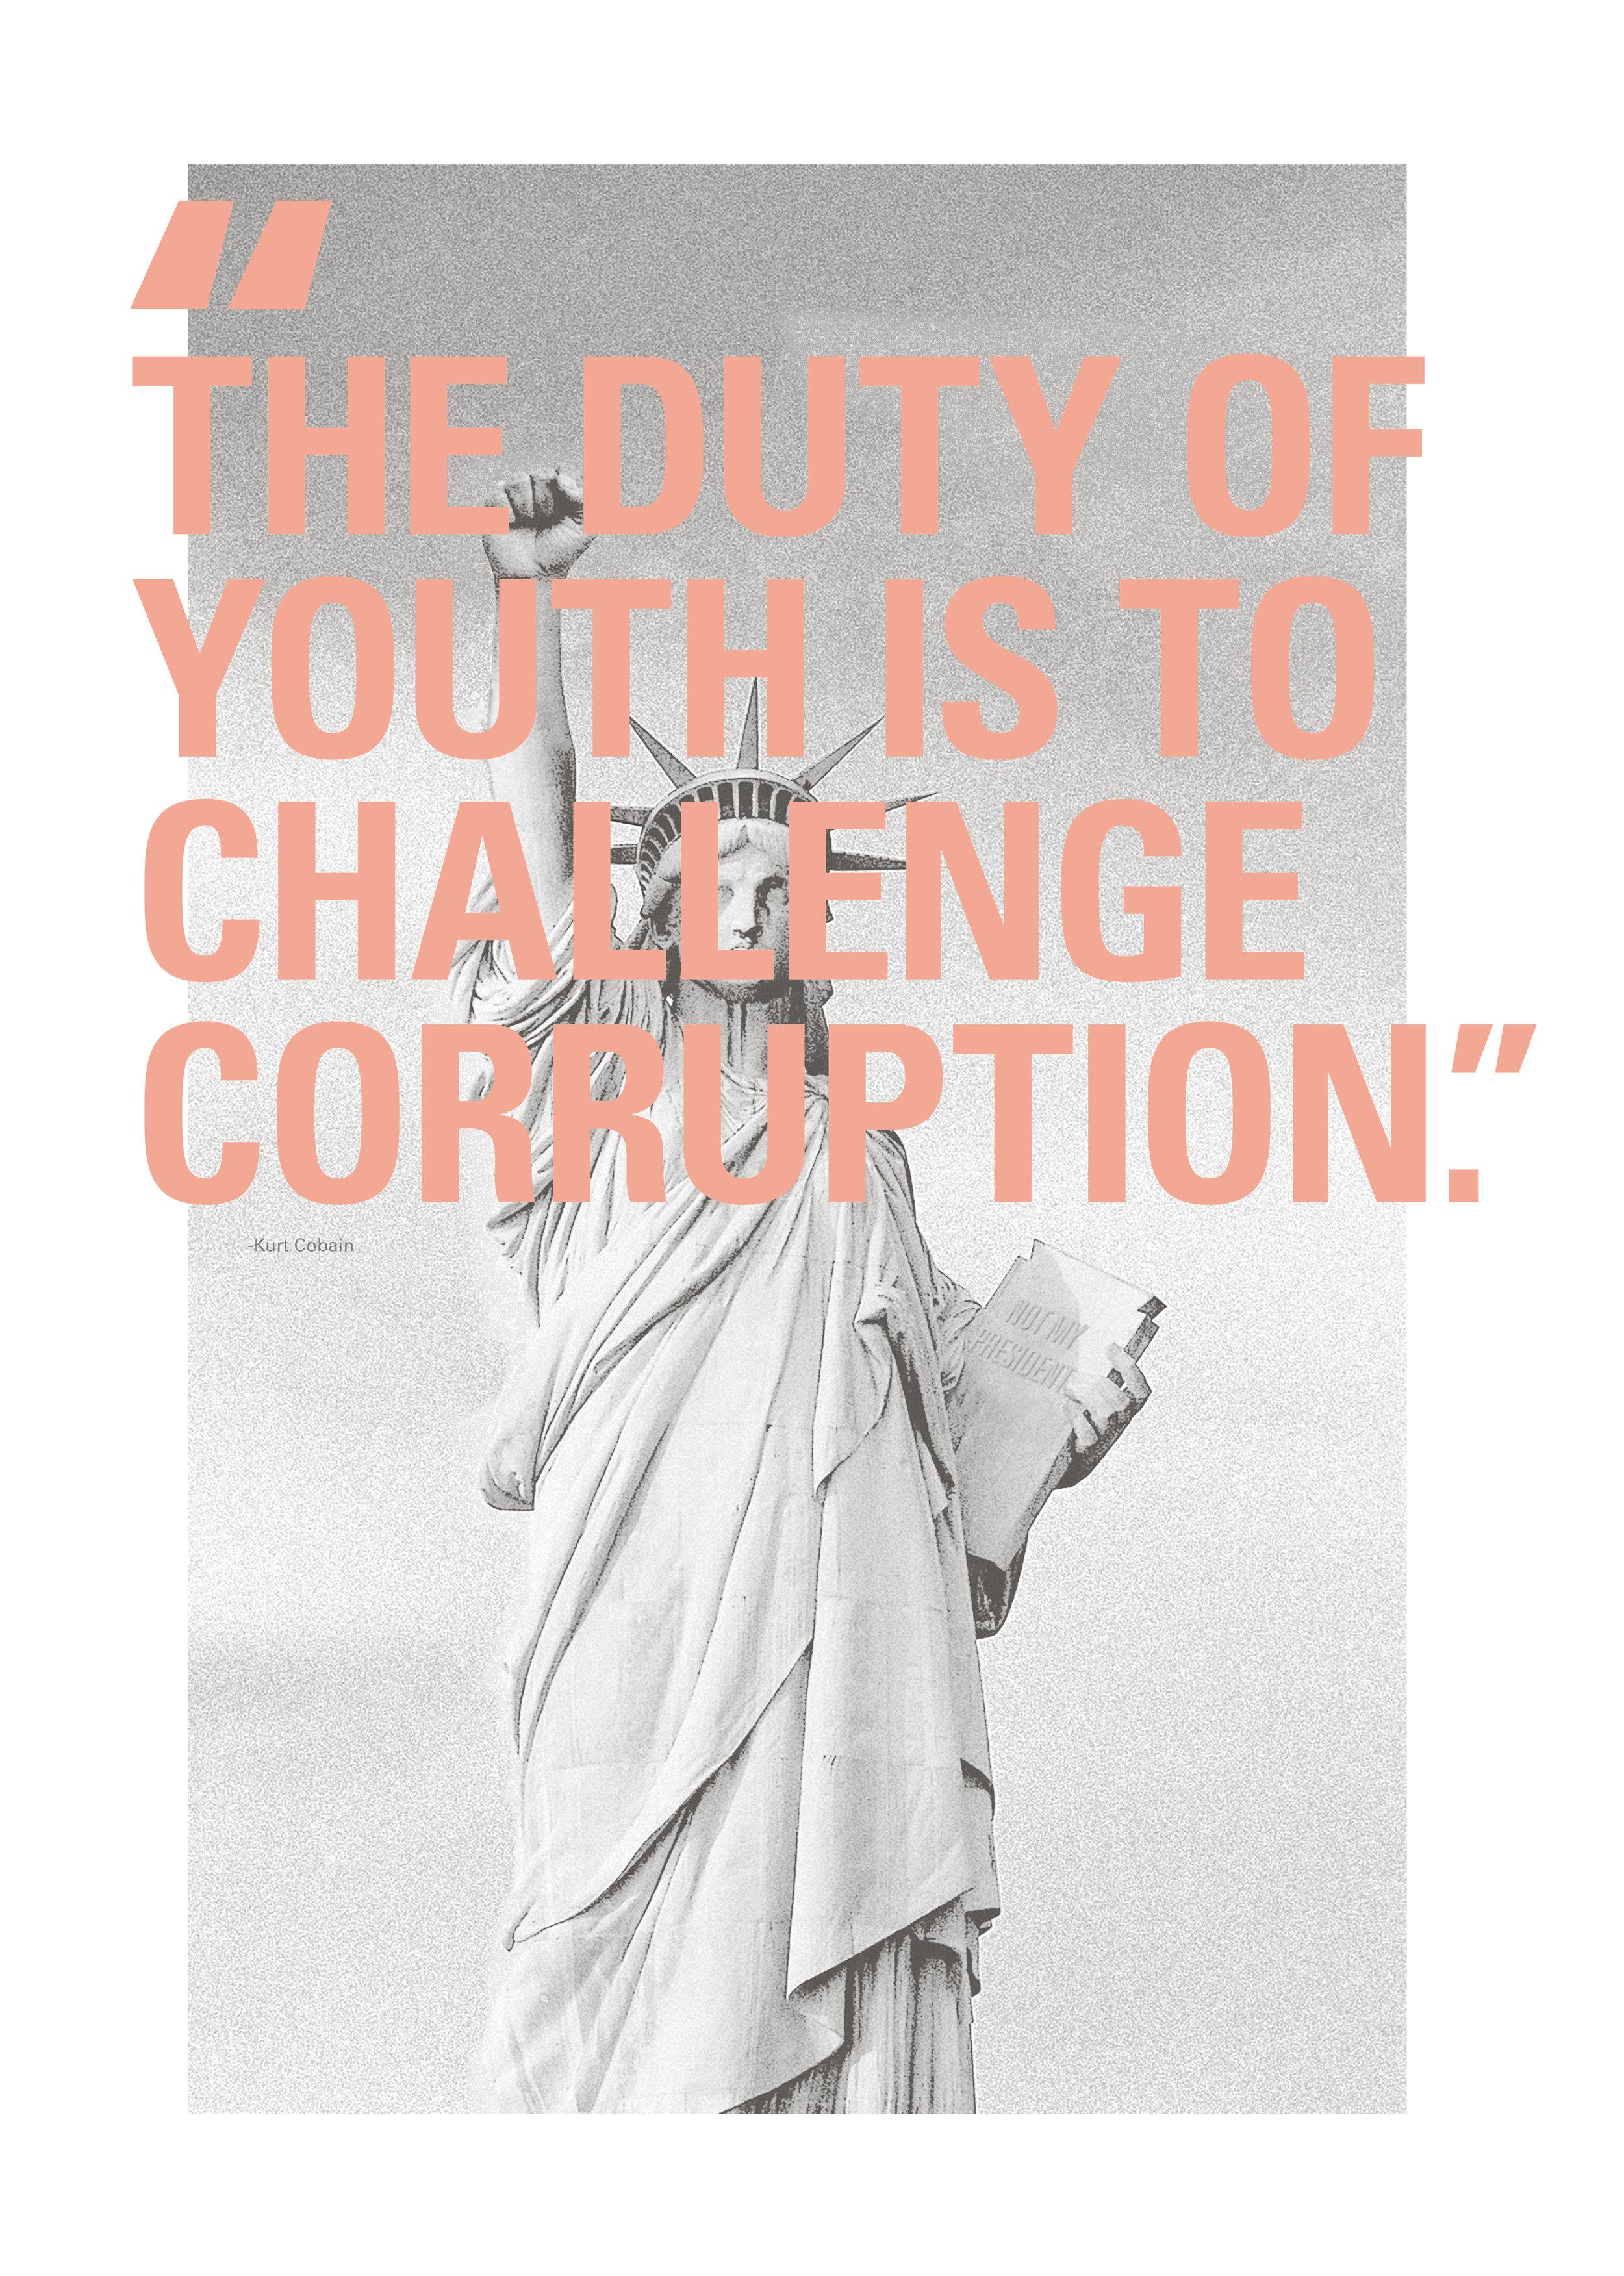 ACT16_Activism101_Poster_p1.jpg